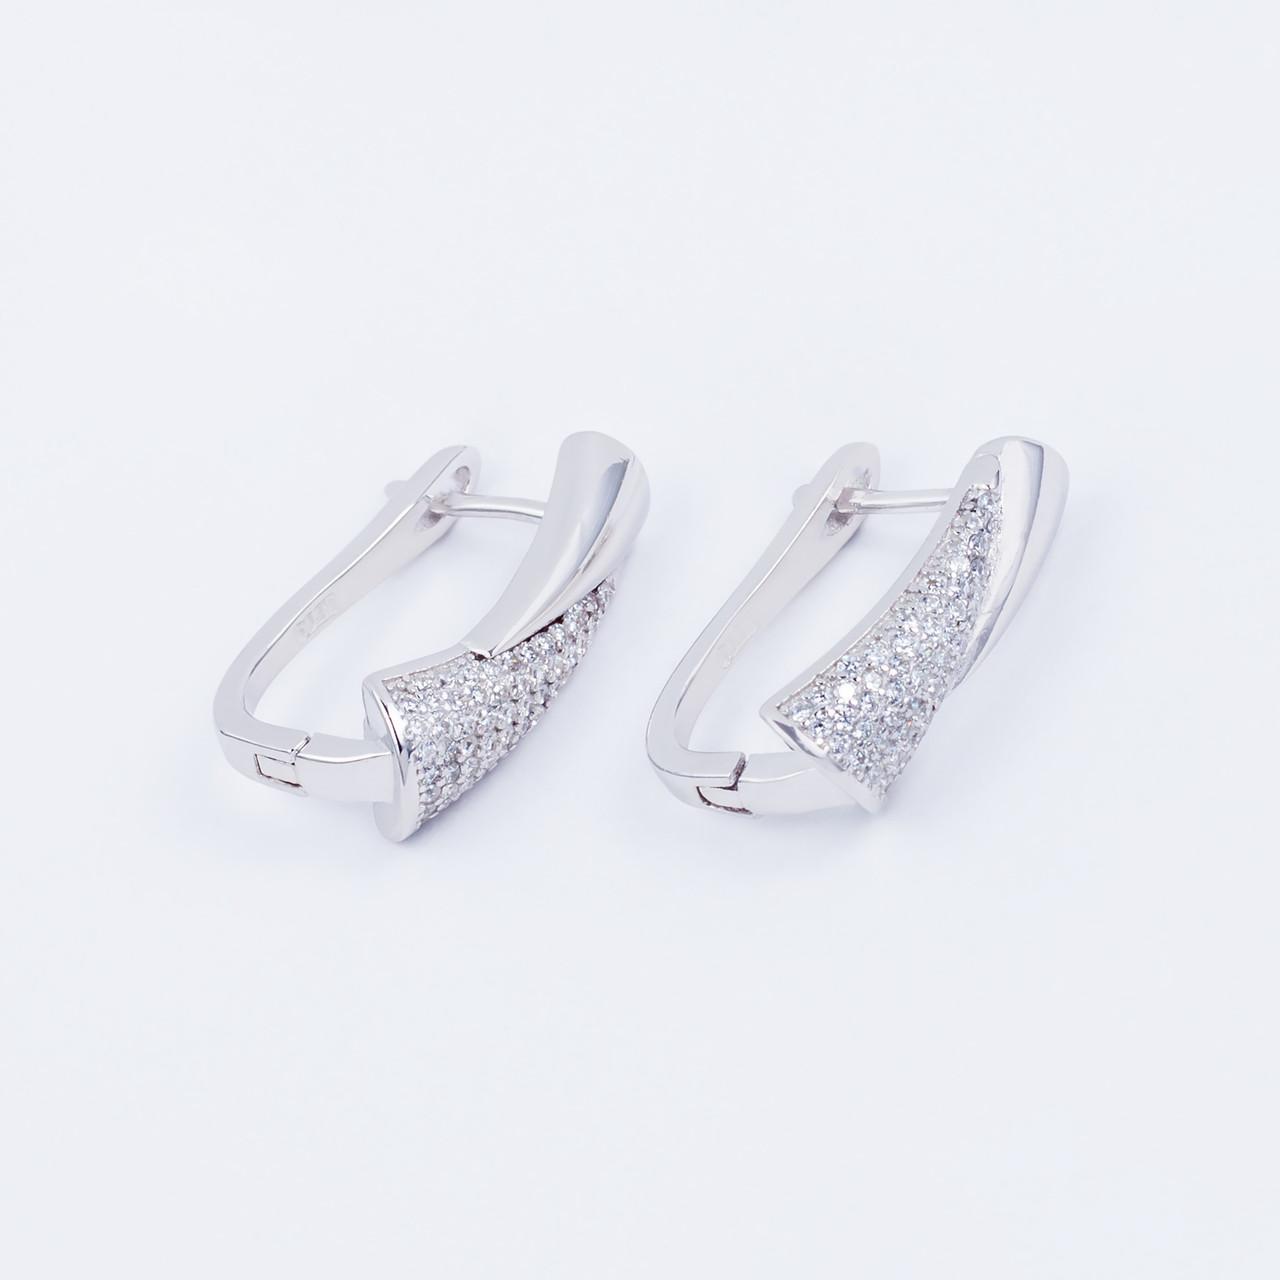 Сережки TOP Silver 5,15 г 9520107б